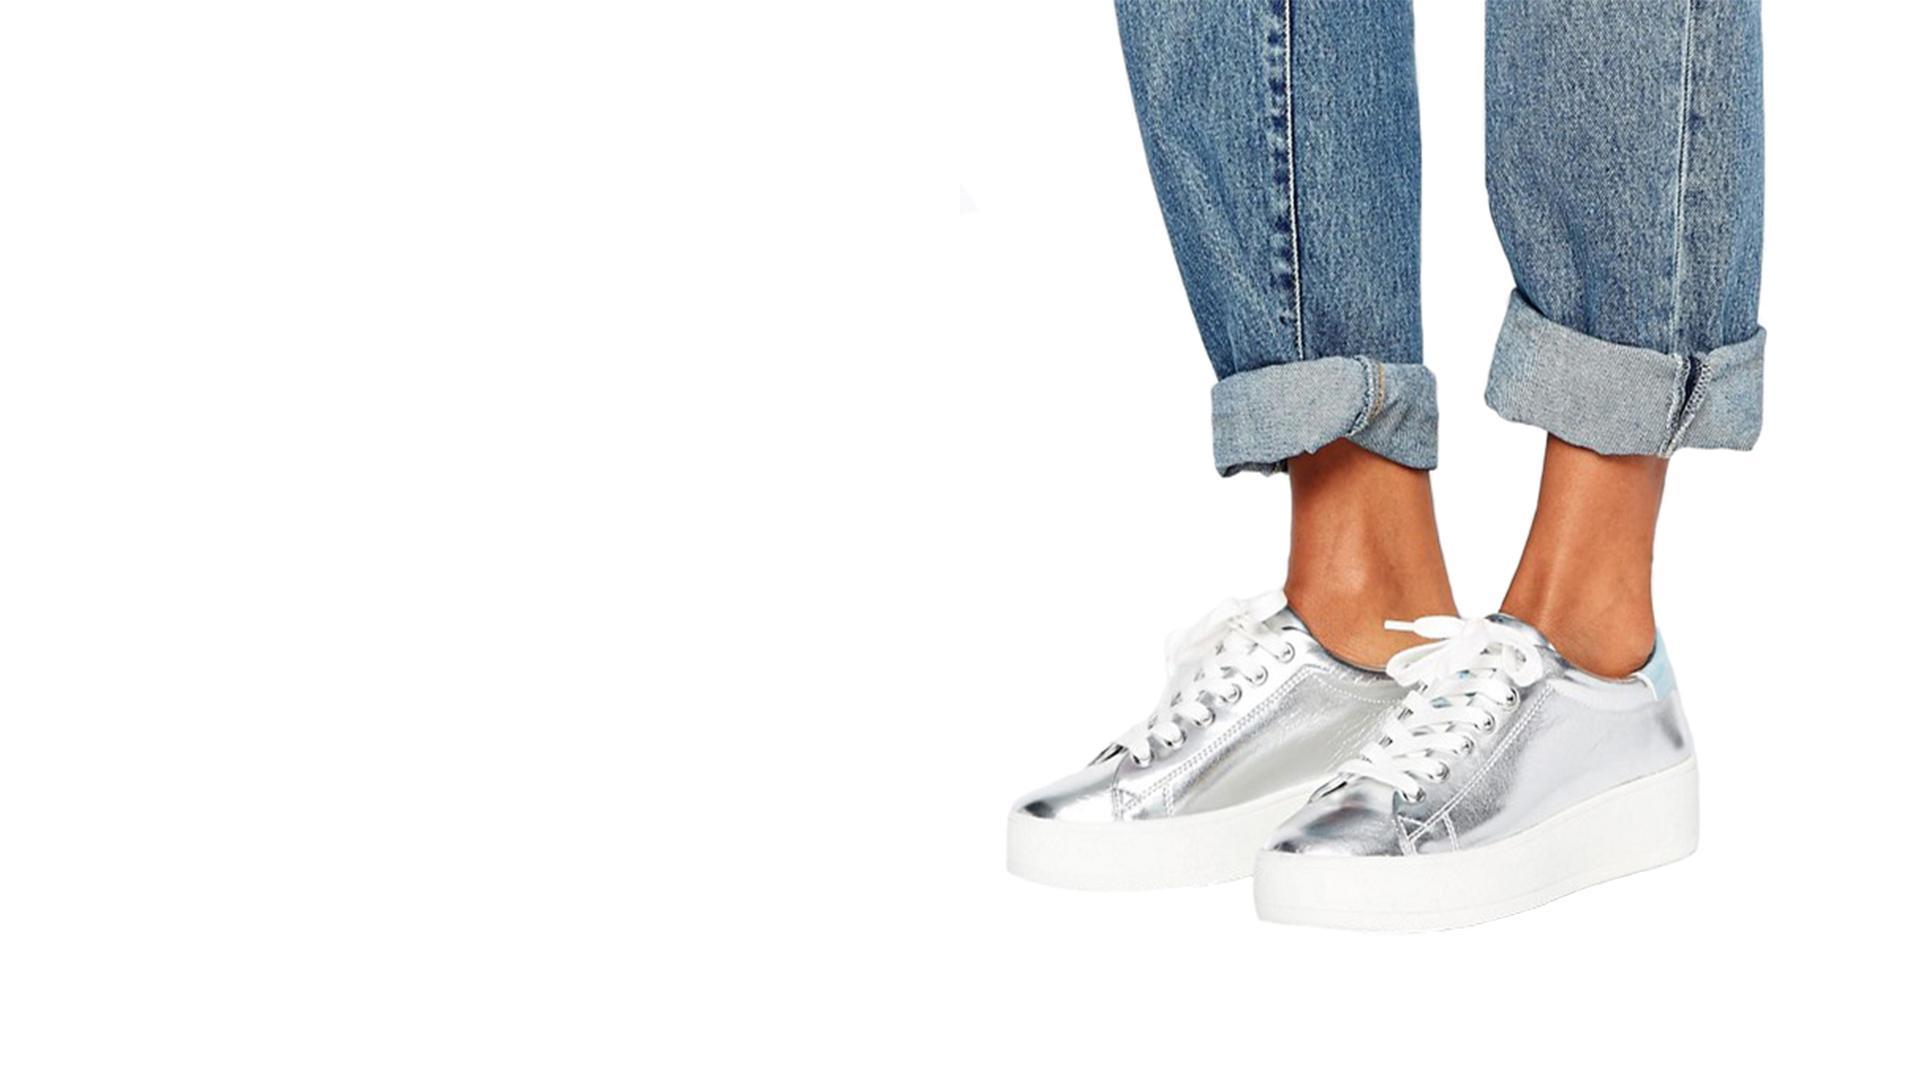 Silver Flatform Trainers - Jain - Dynabeat